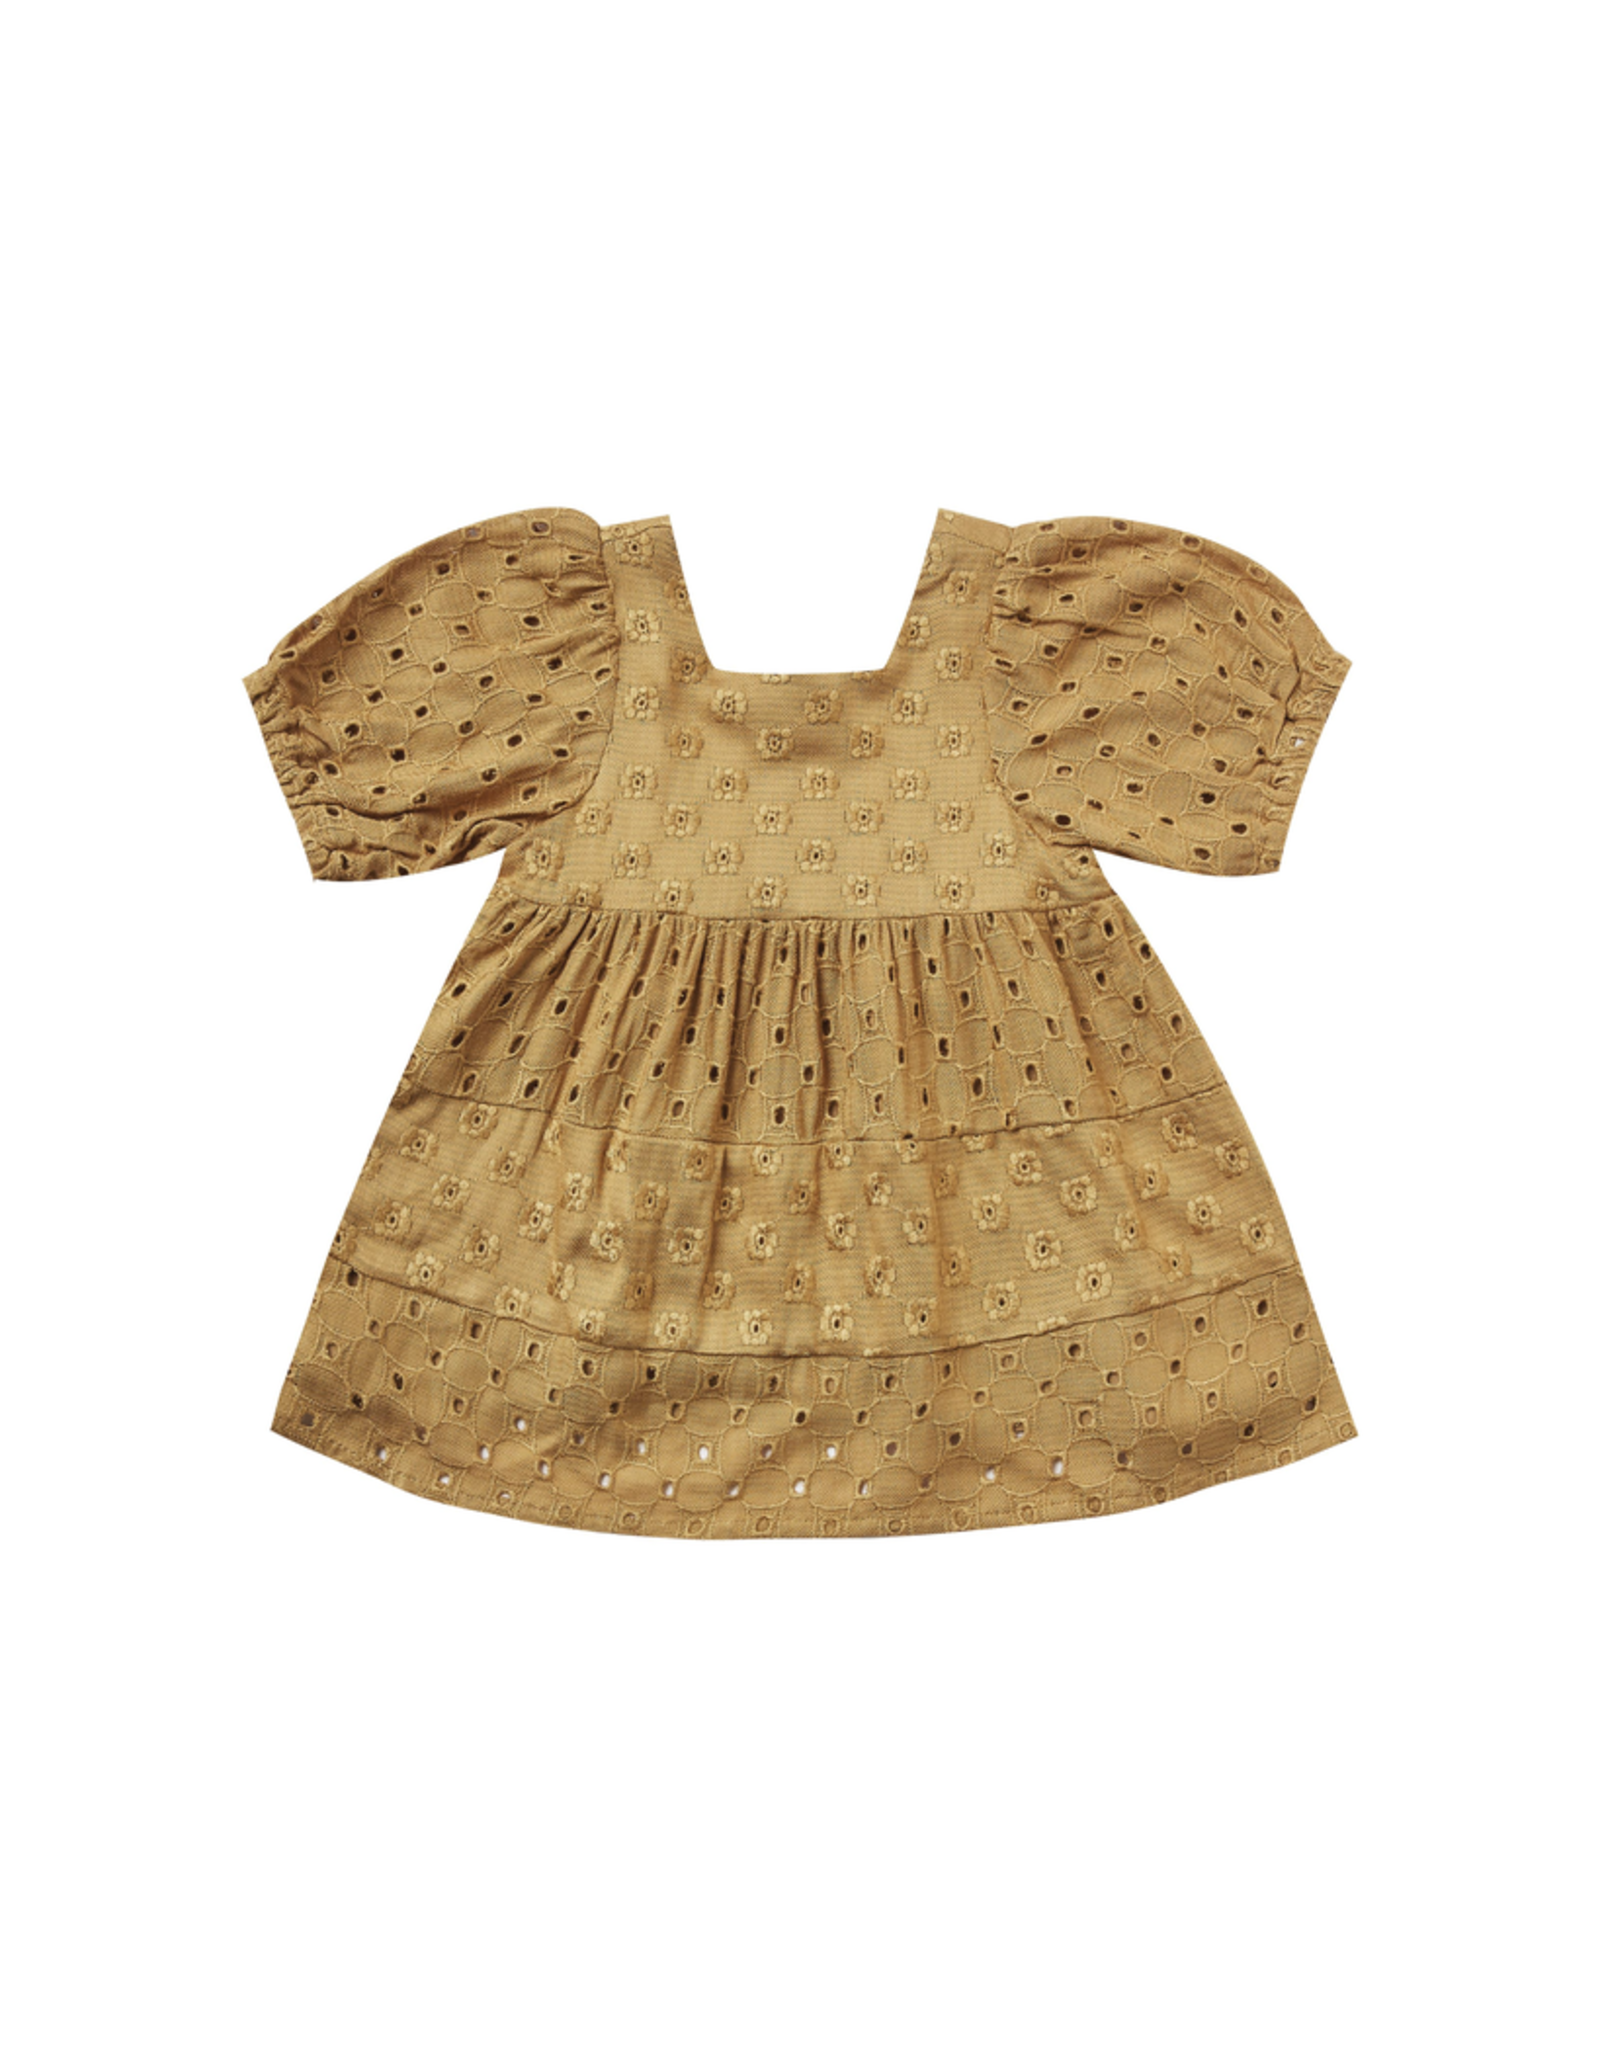 rylee cru rylee + cru gretta baby doll dress